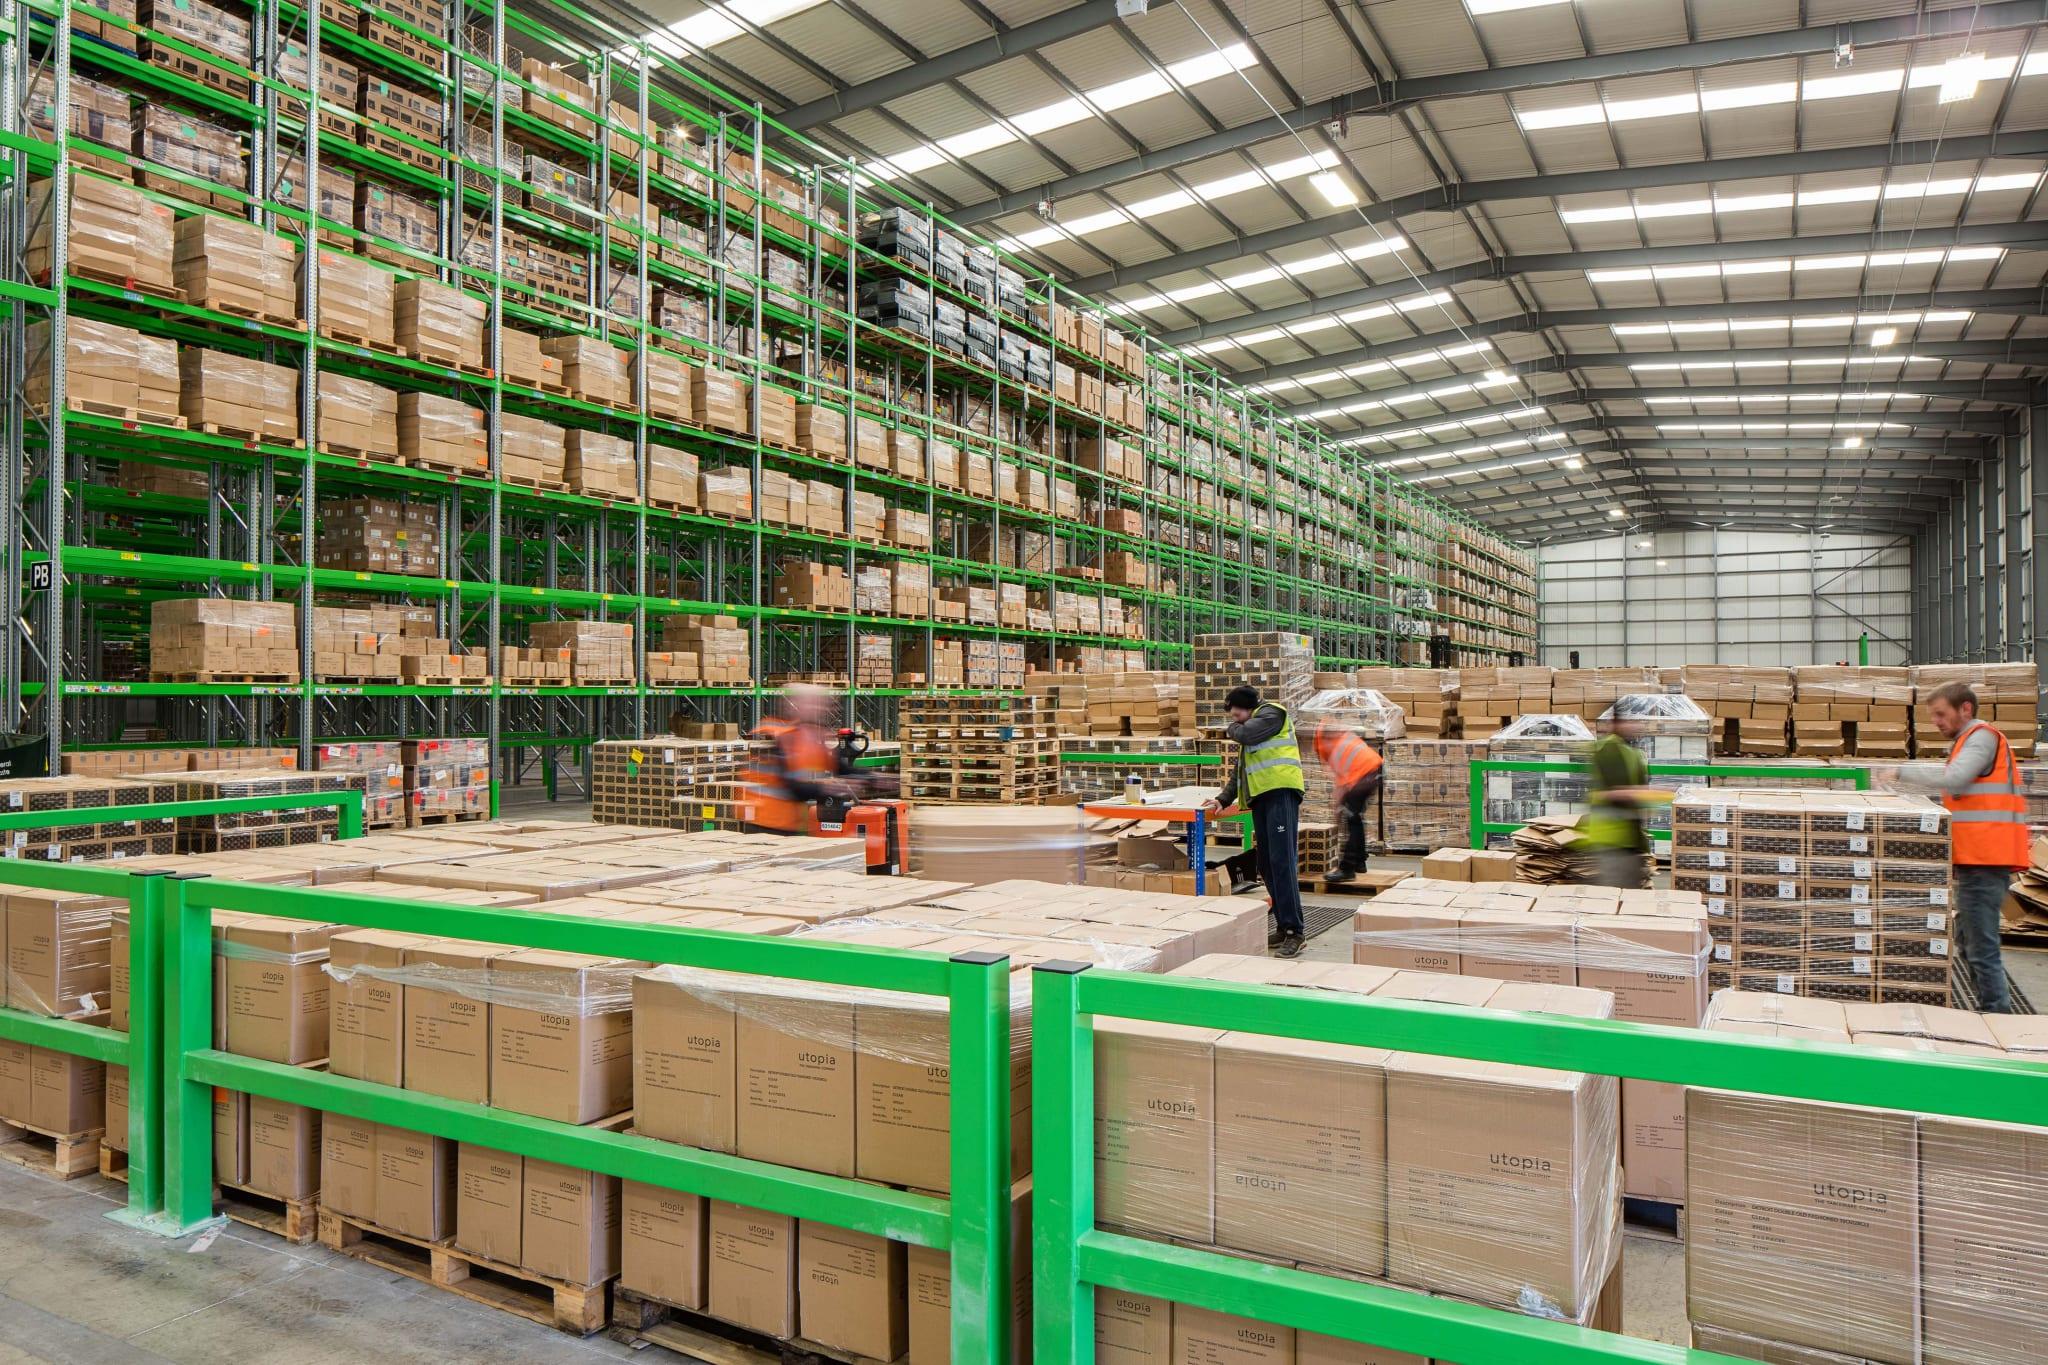 Utopia warehouse